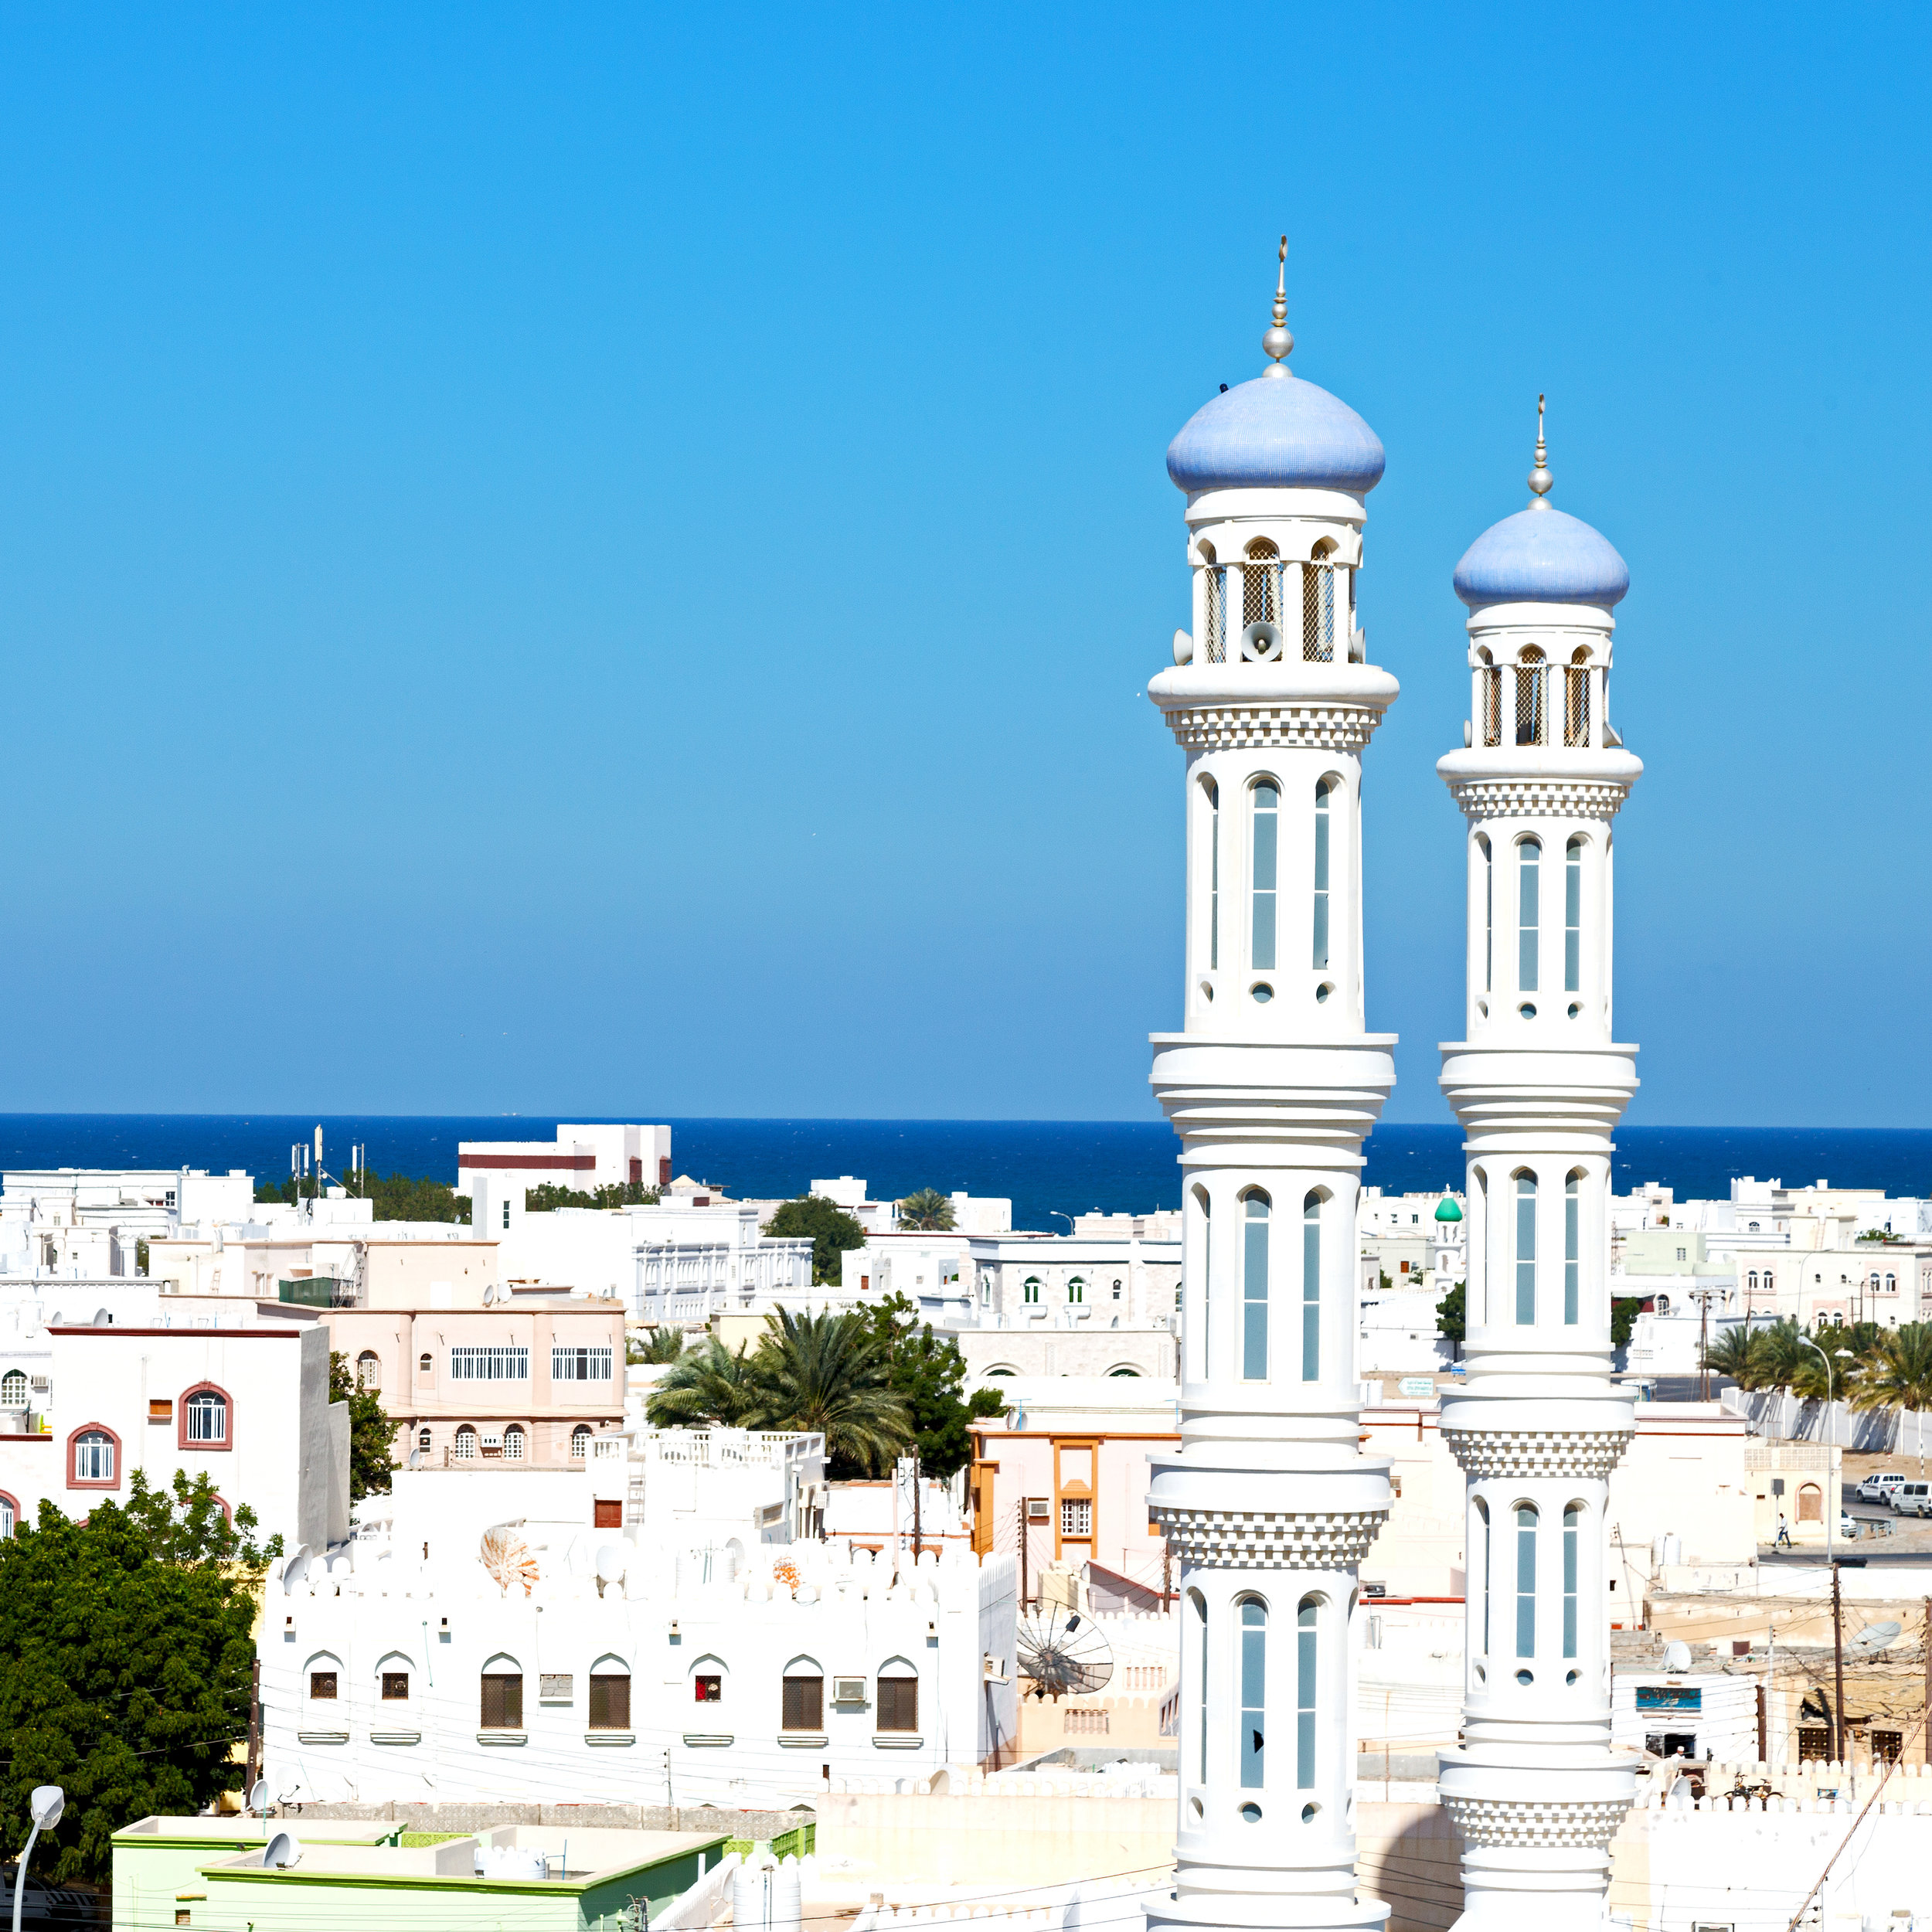 oman_bigstock-In-Oman-Muscat-The-Old-Mosque--164641271.jpg